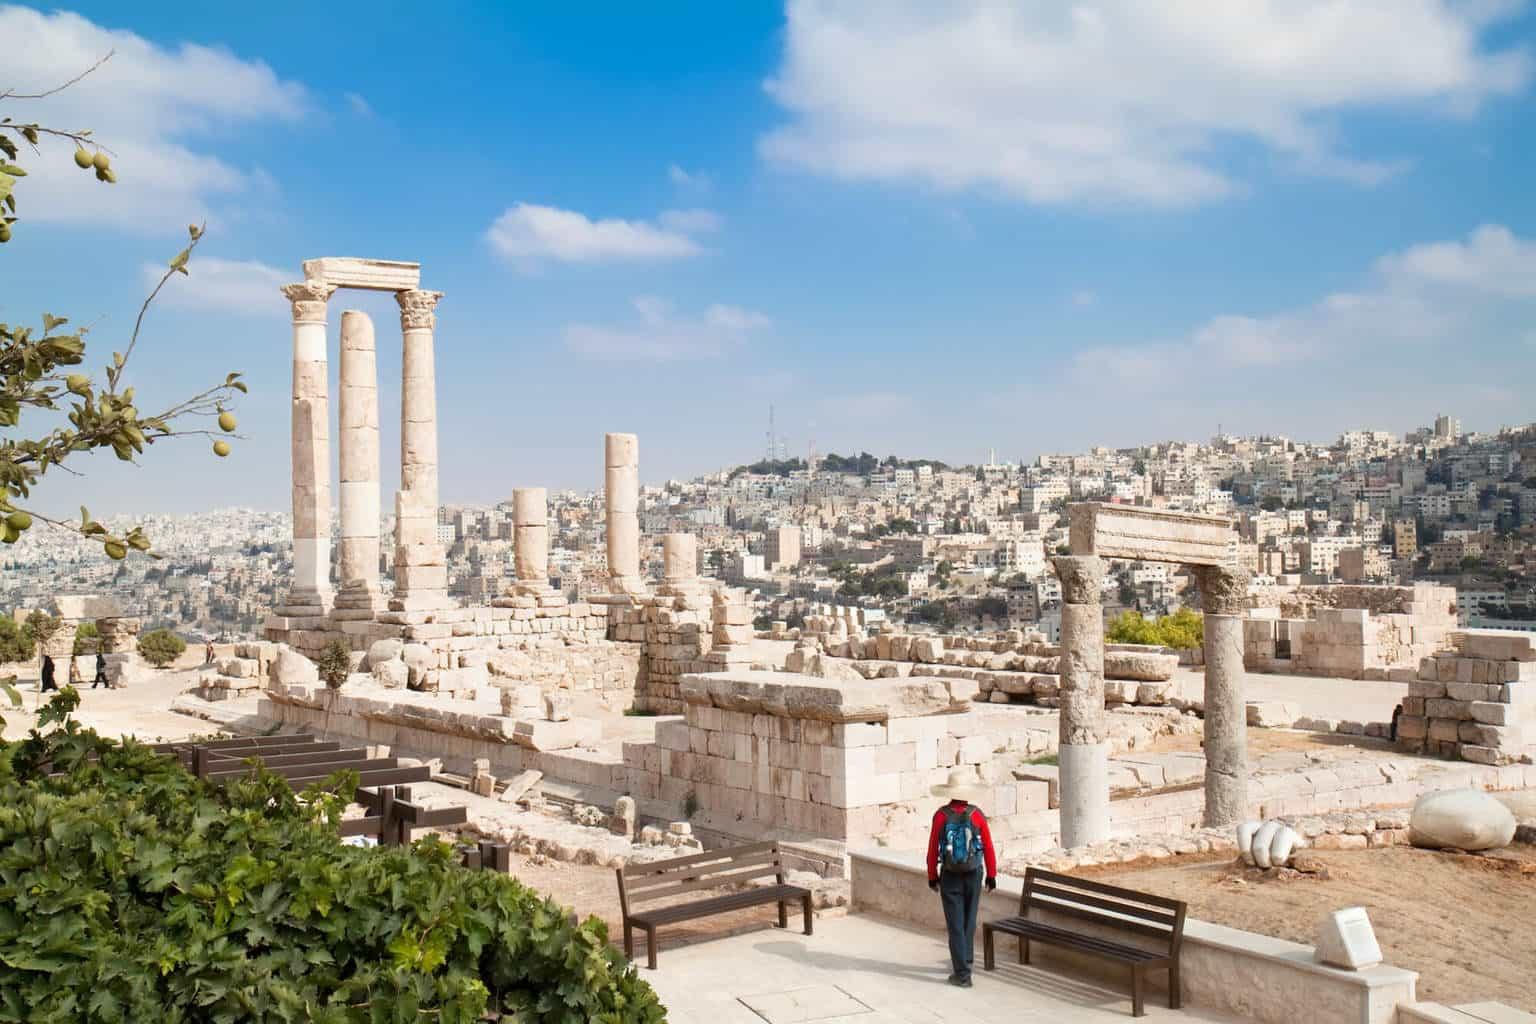 Amman chat